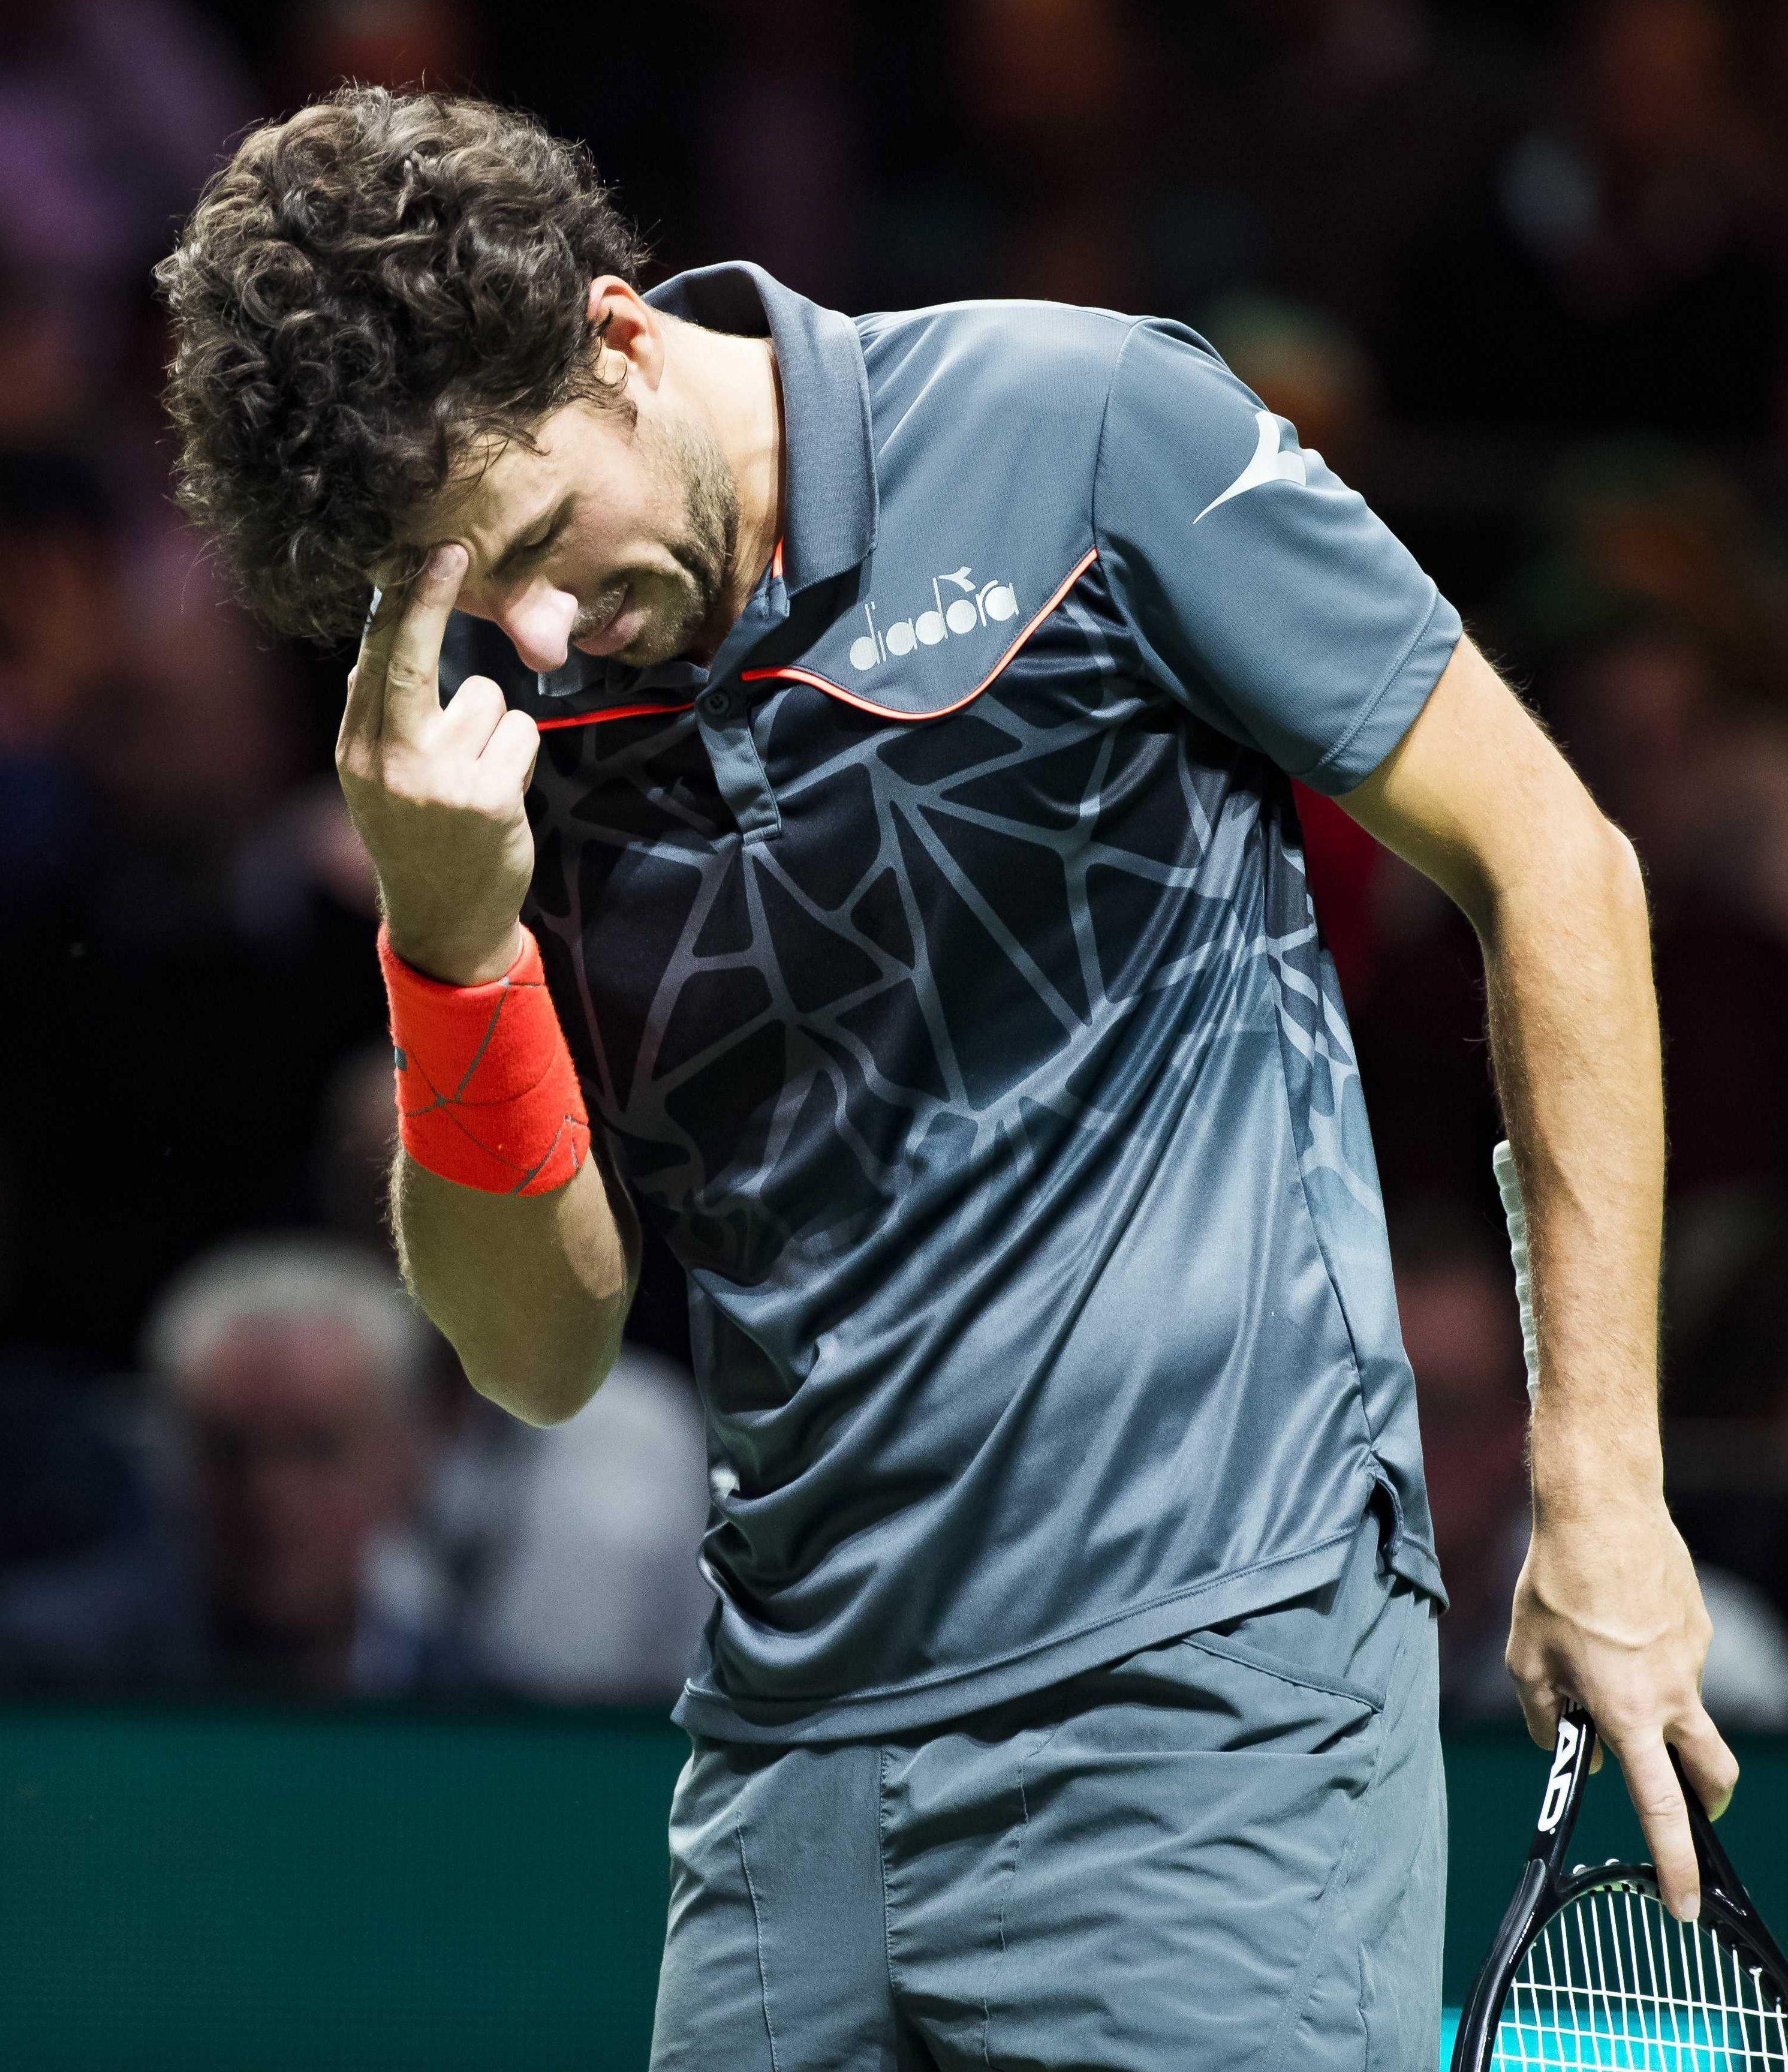 Robin Haase could do nothing to stop Roger Federer battling back for victory